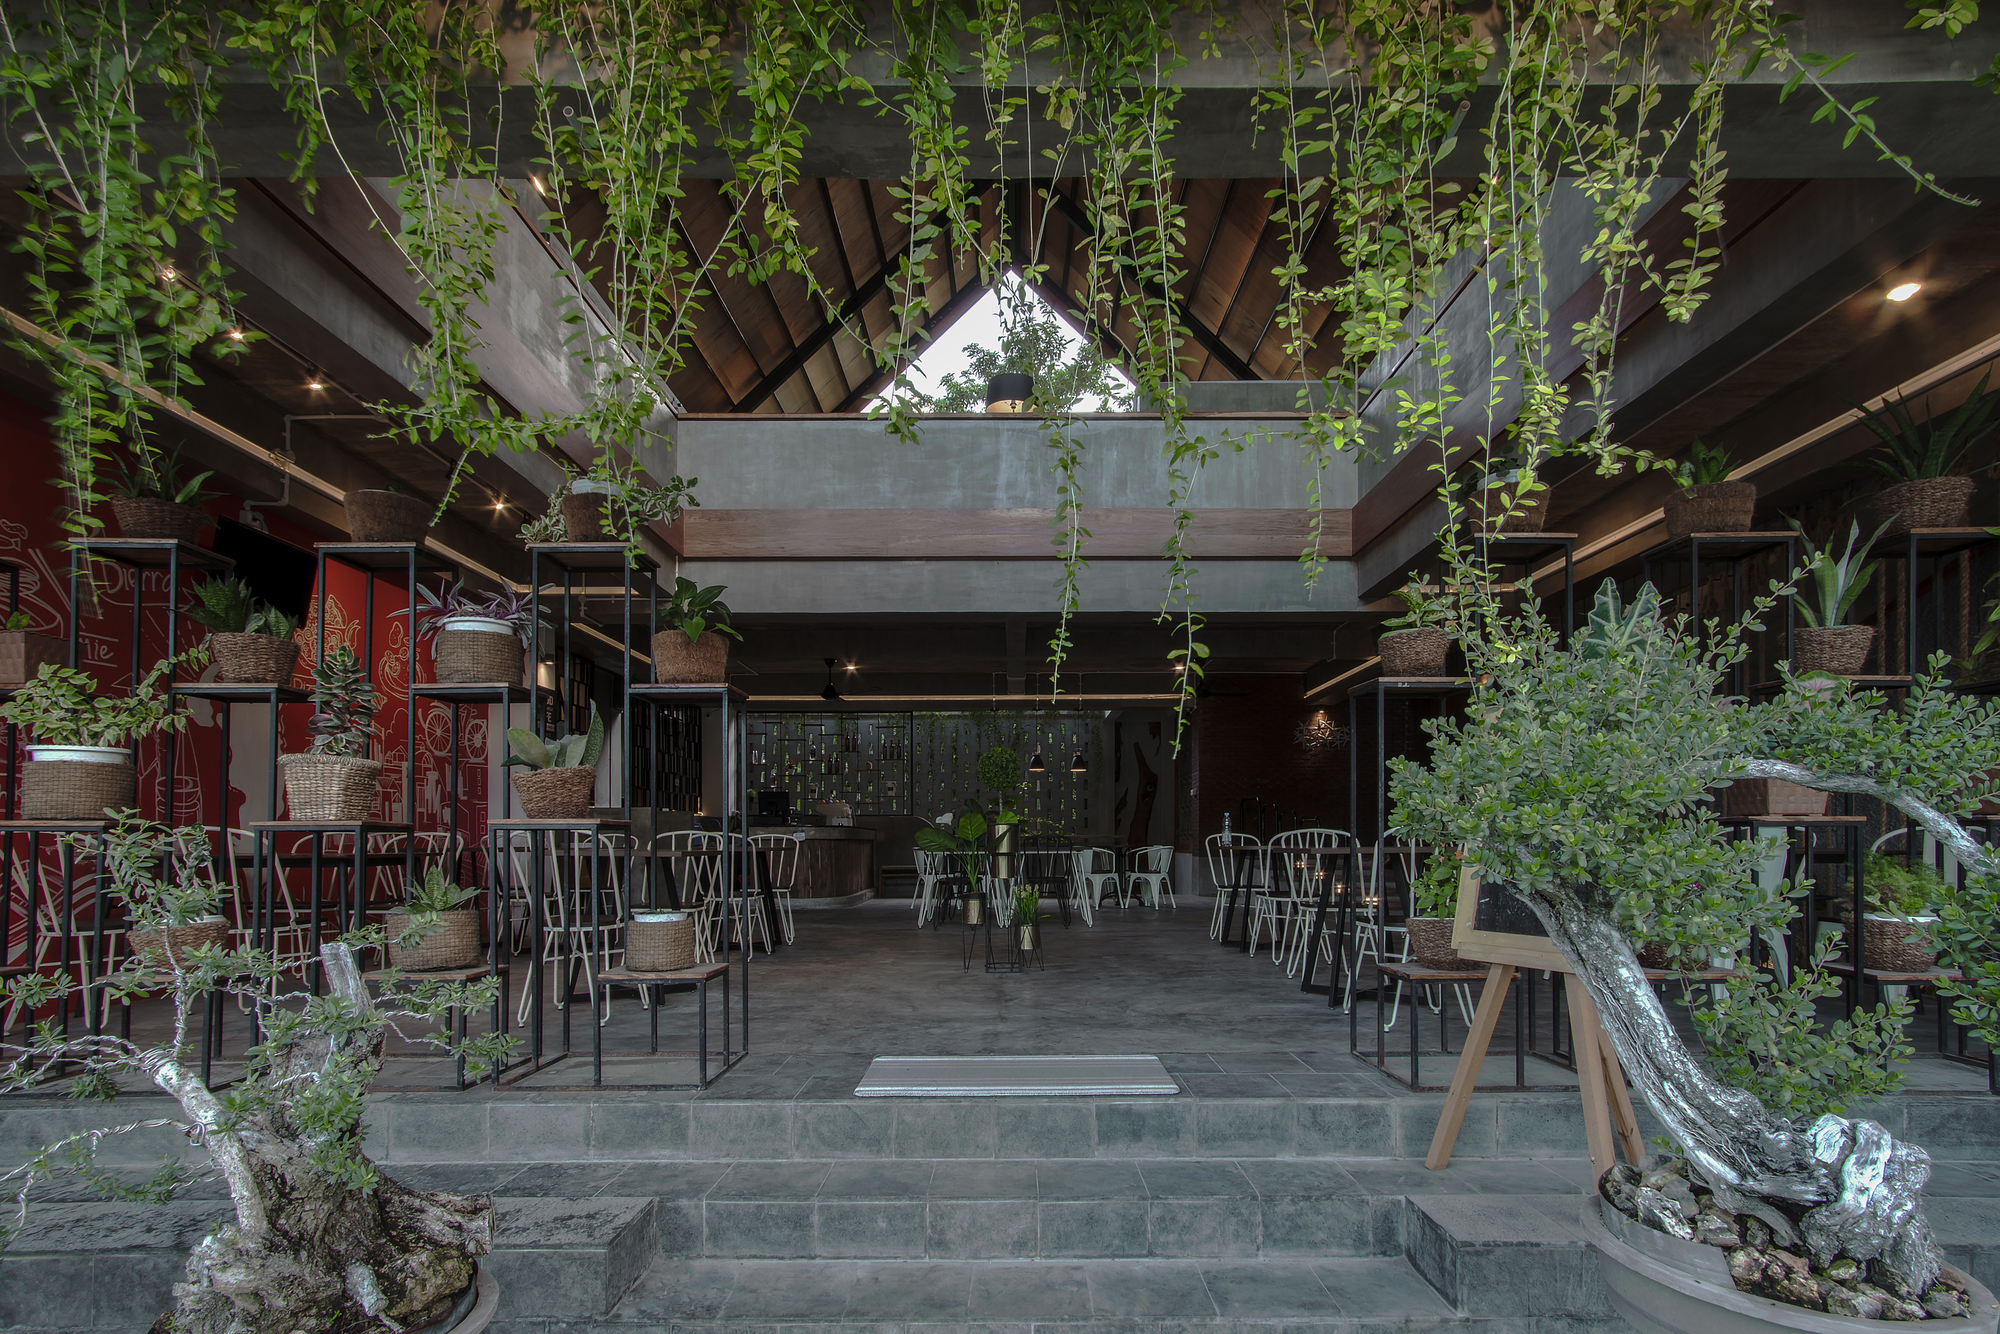 Dierra Café / MIV Architects